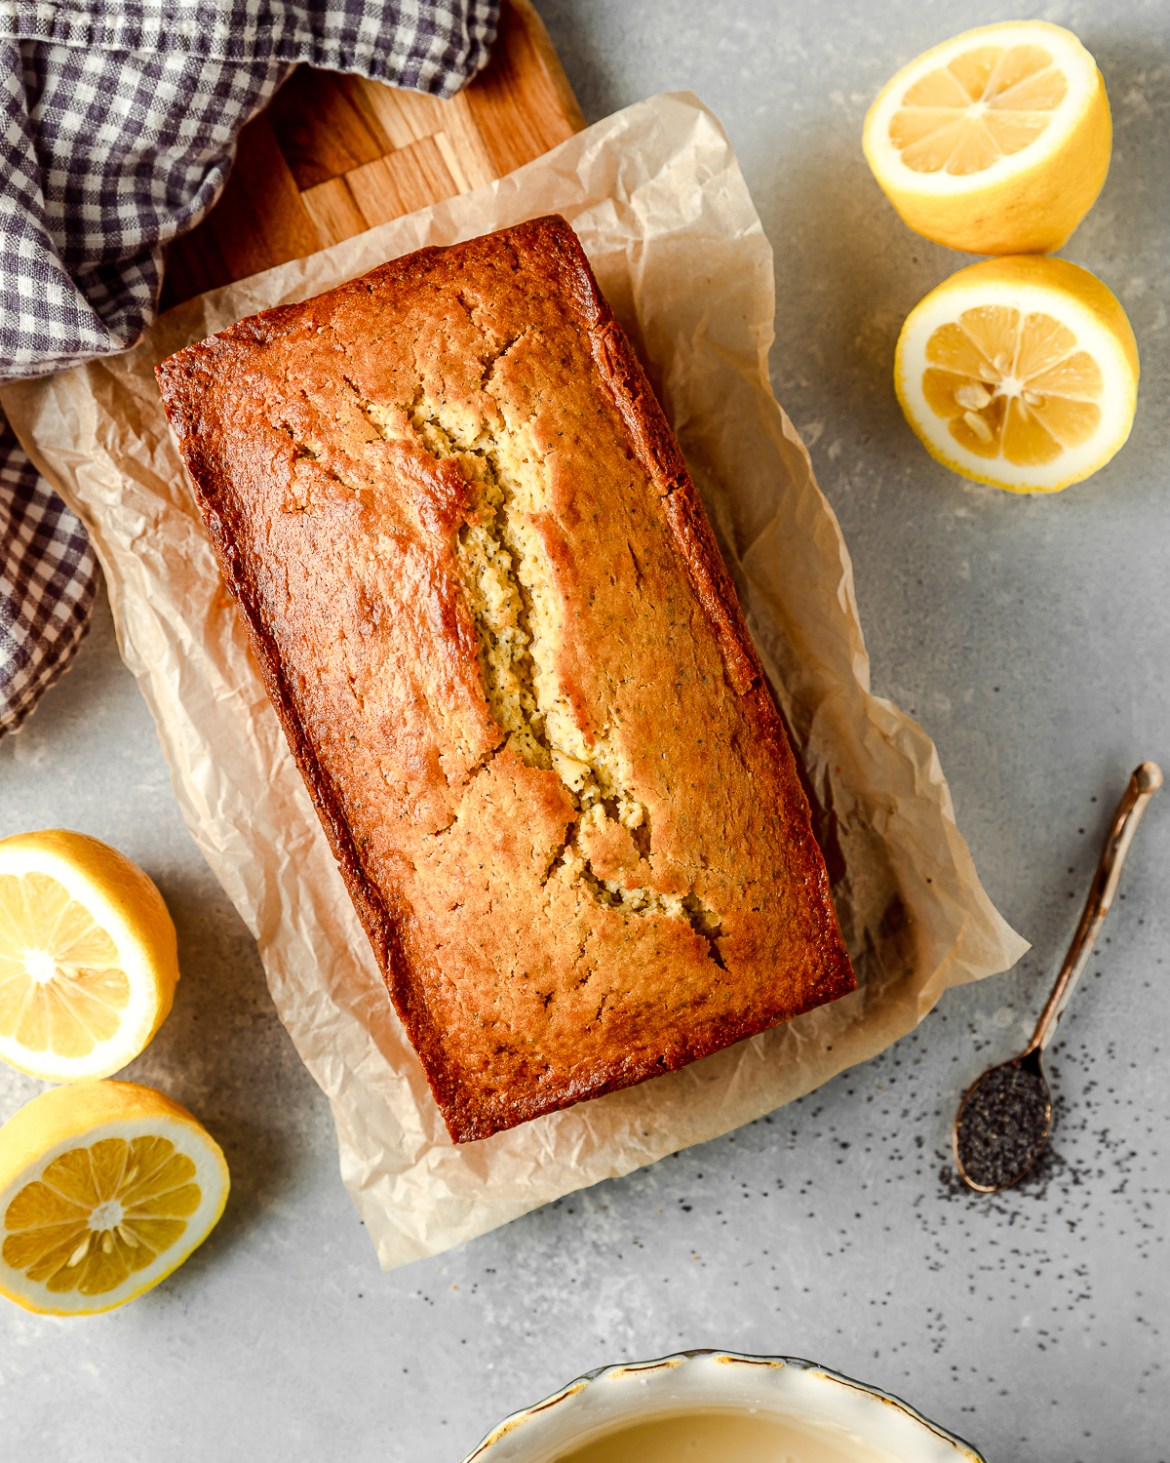 Poppy Seed Pound Cake with lemons